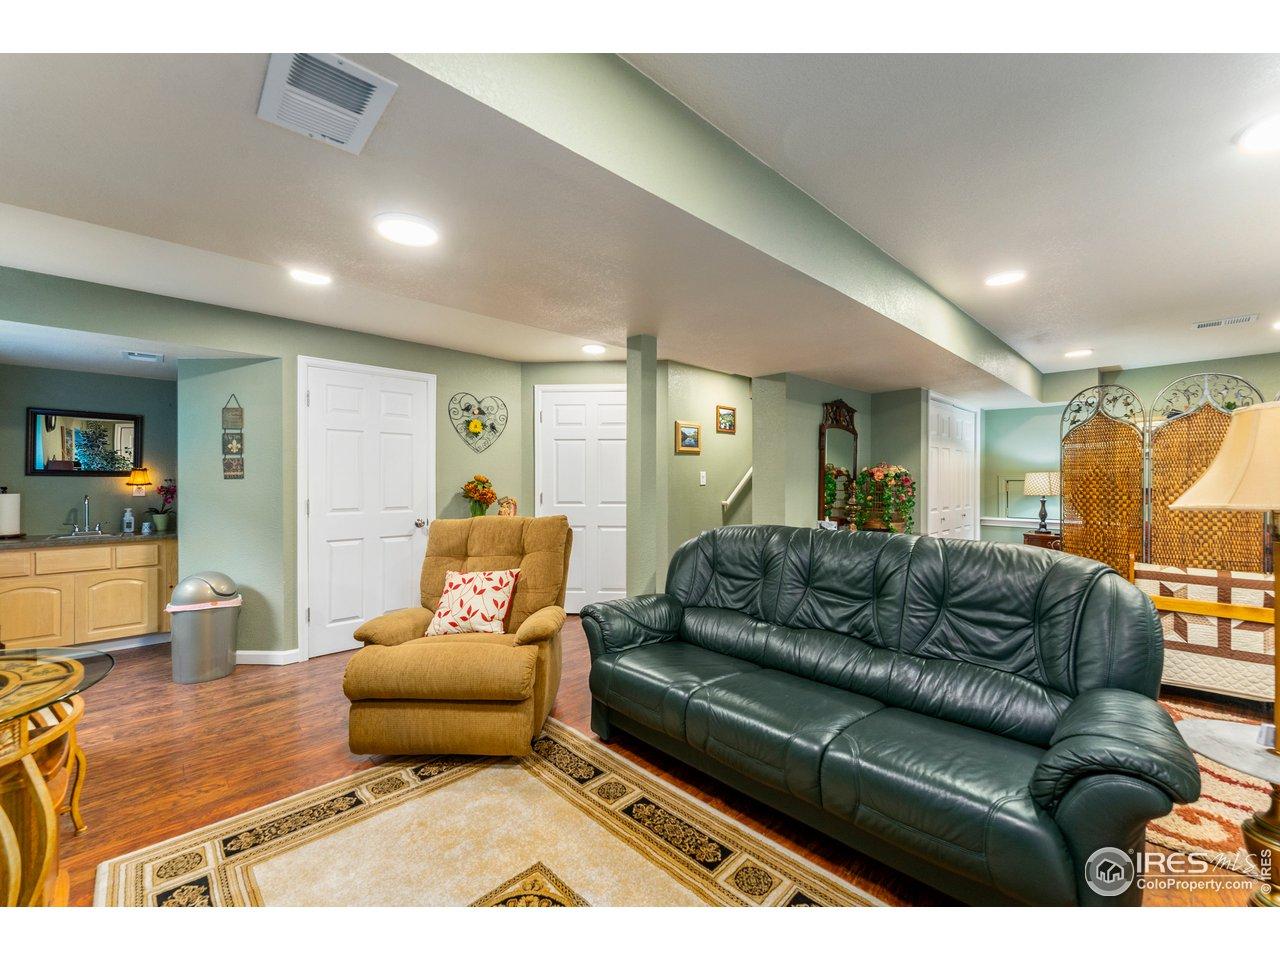 Basement featuring engineered hardwood floors